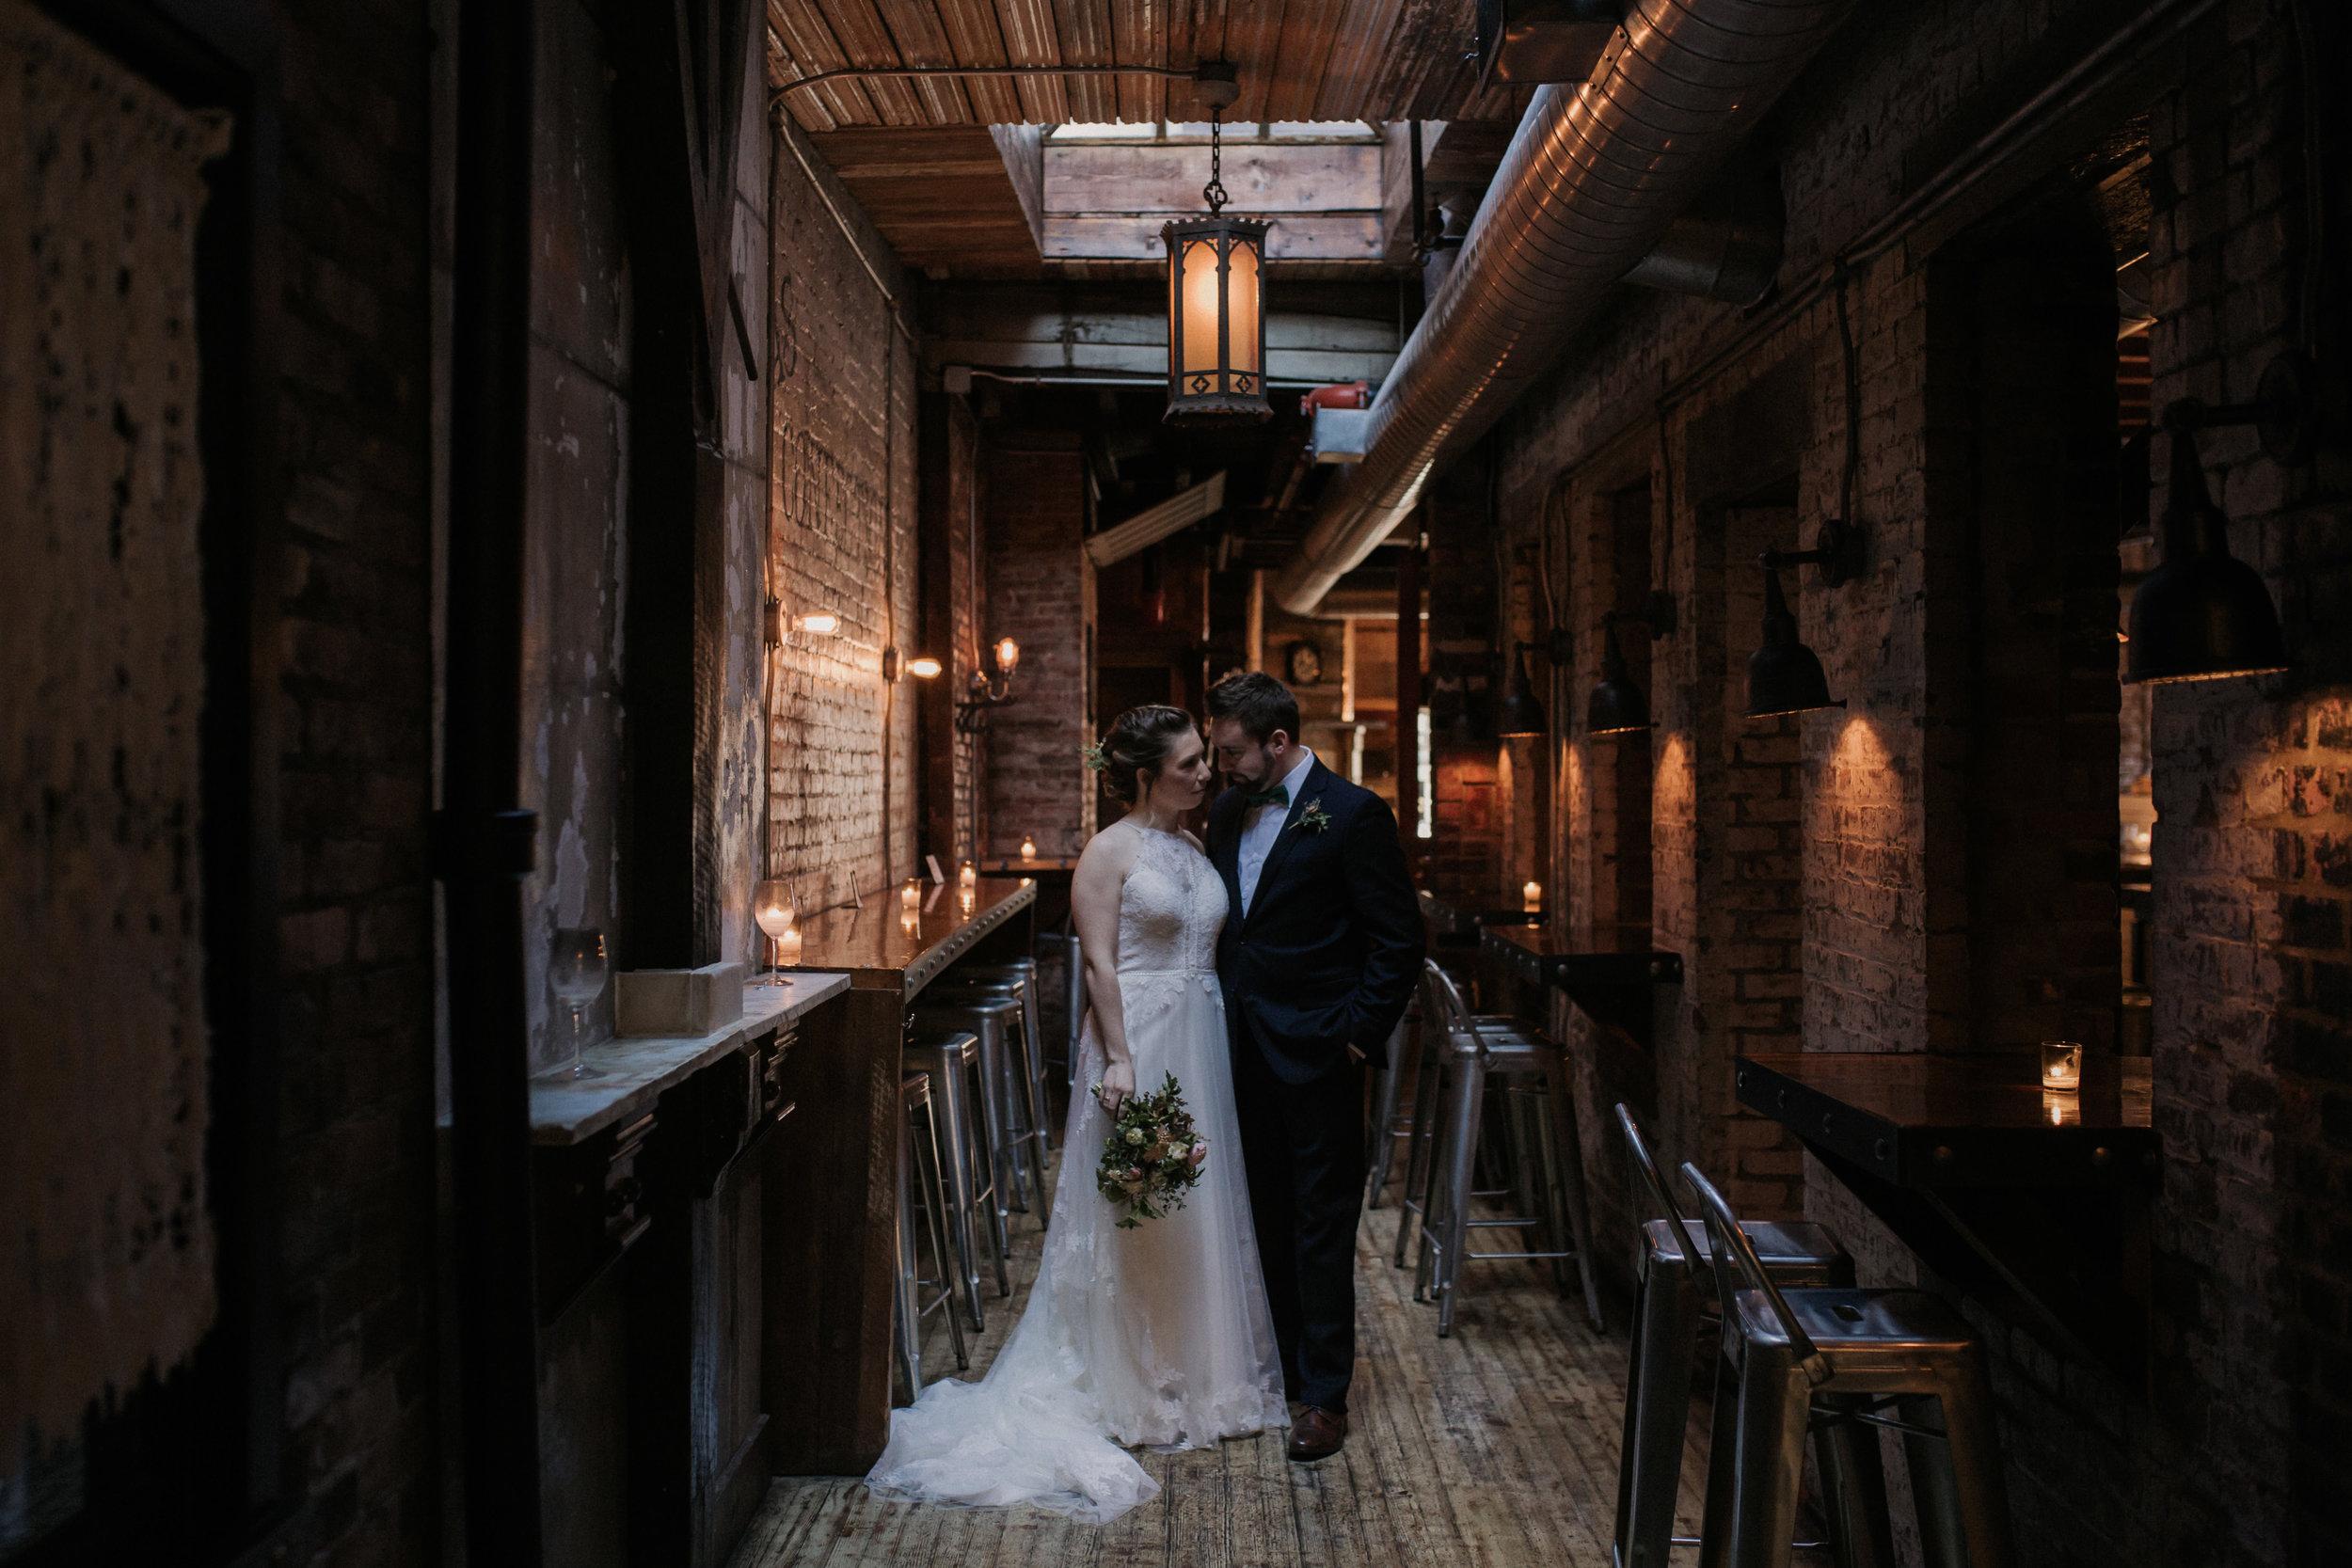 lucas_confectionery_wedding_031.JPG